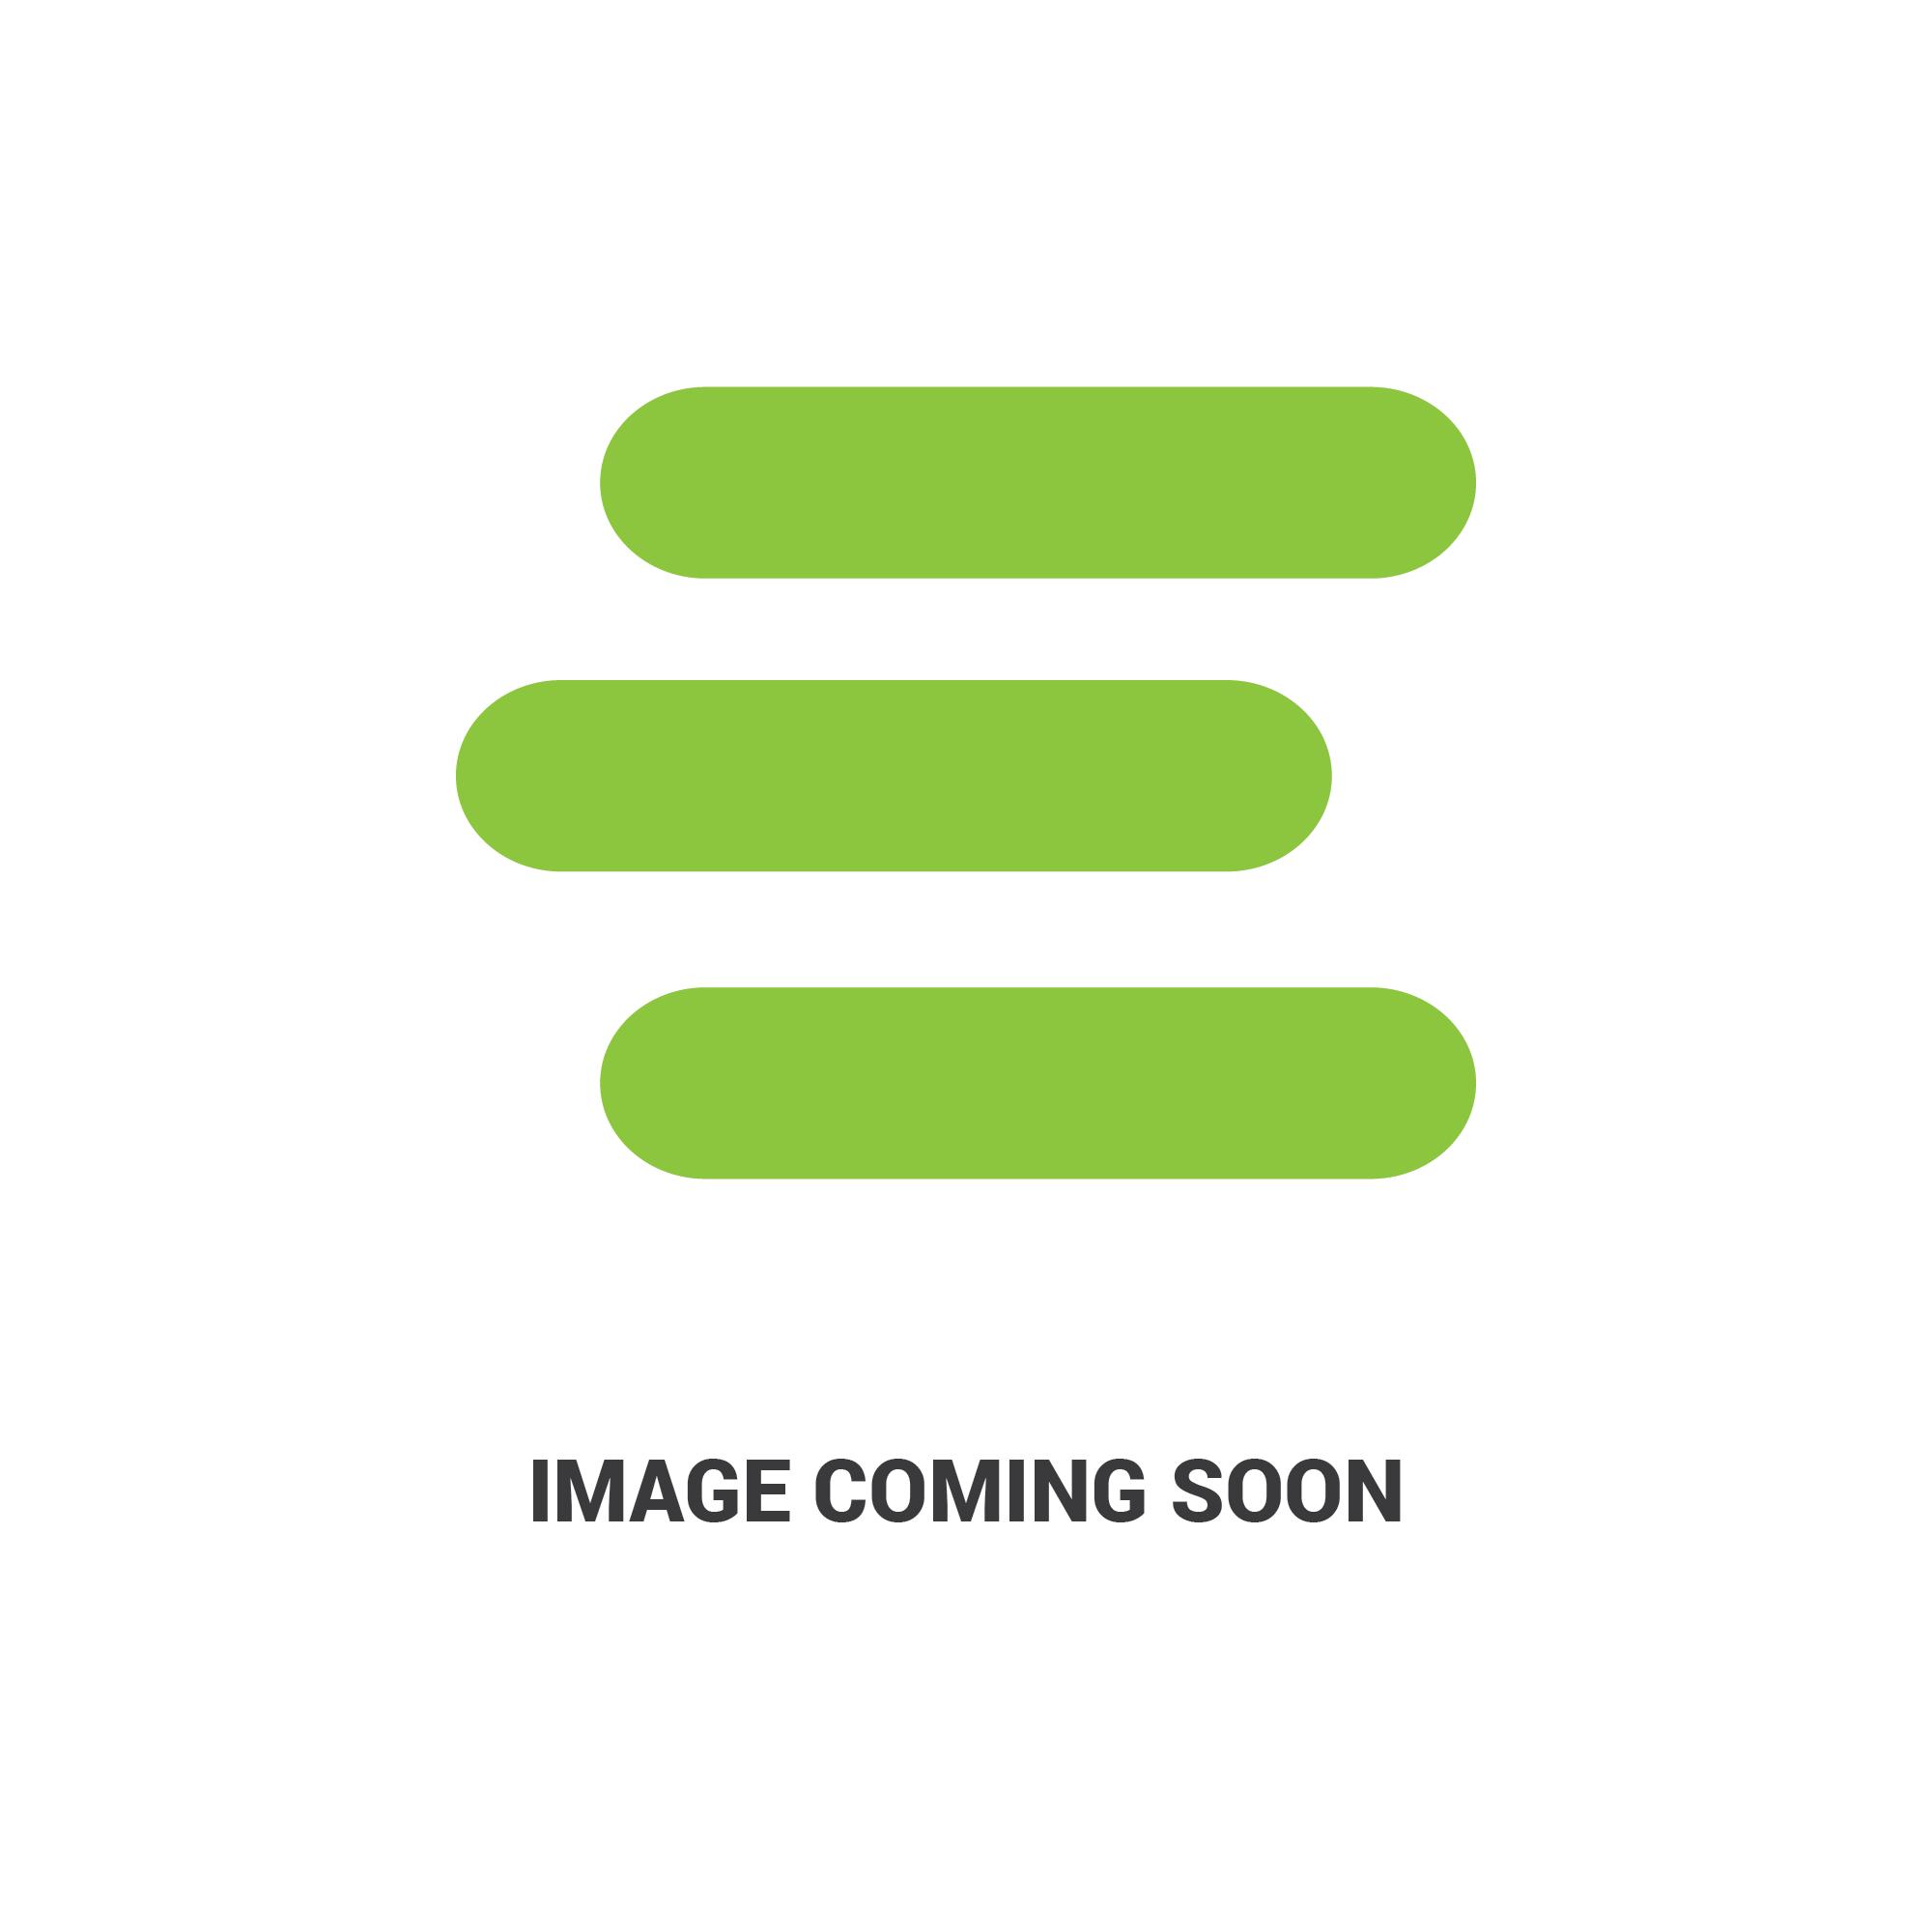 E-326-368Aedit 1.jpg